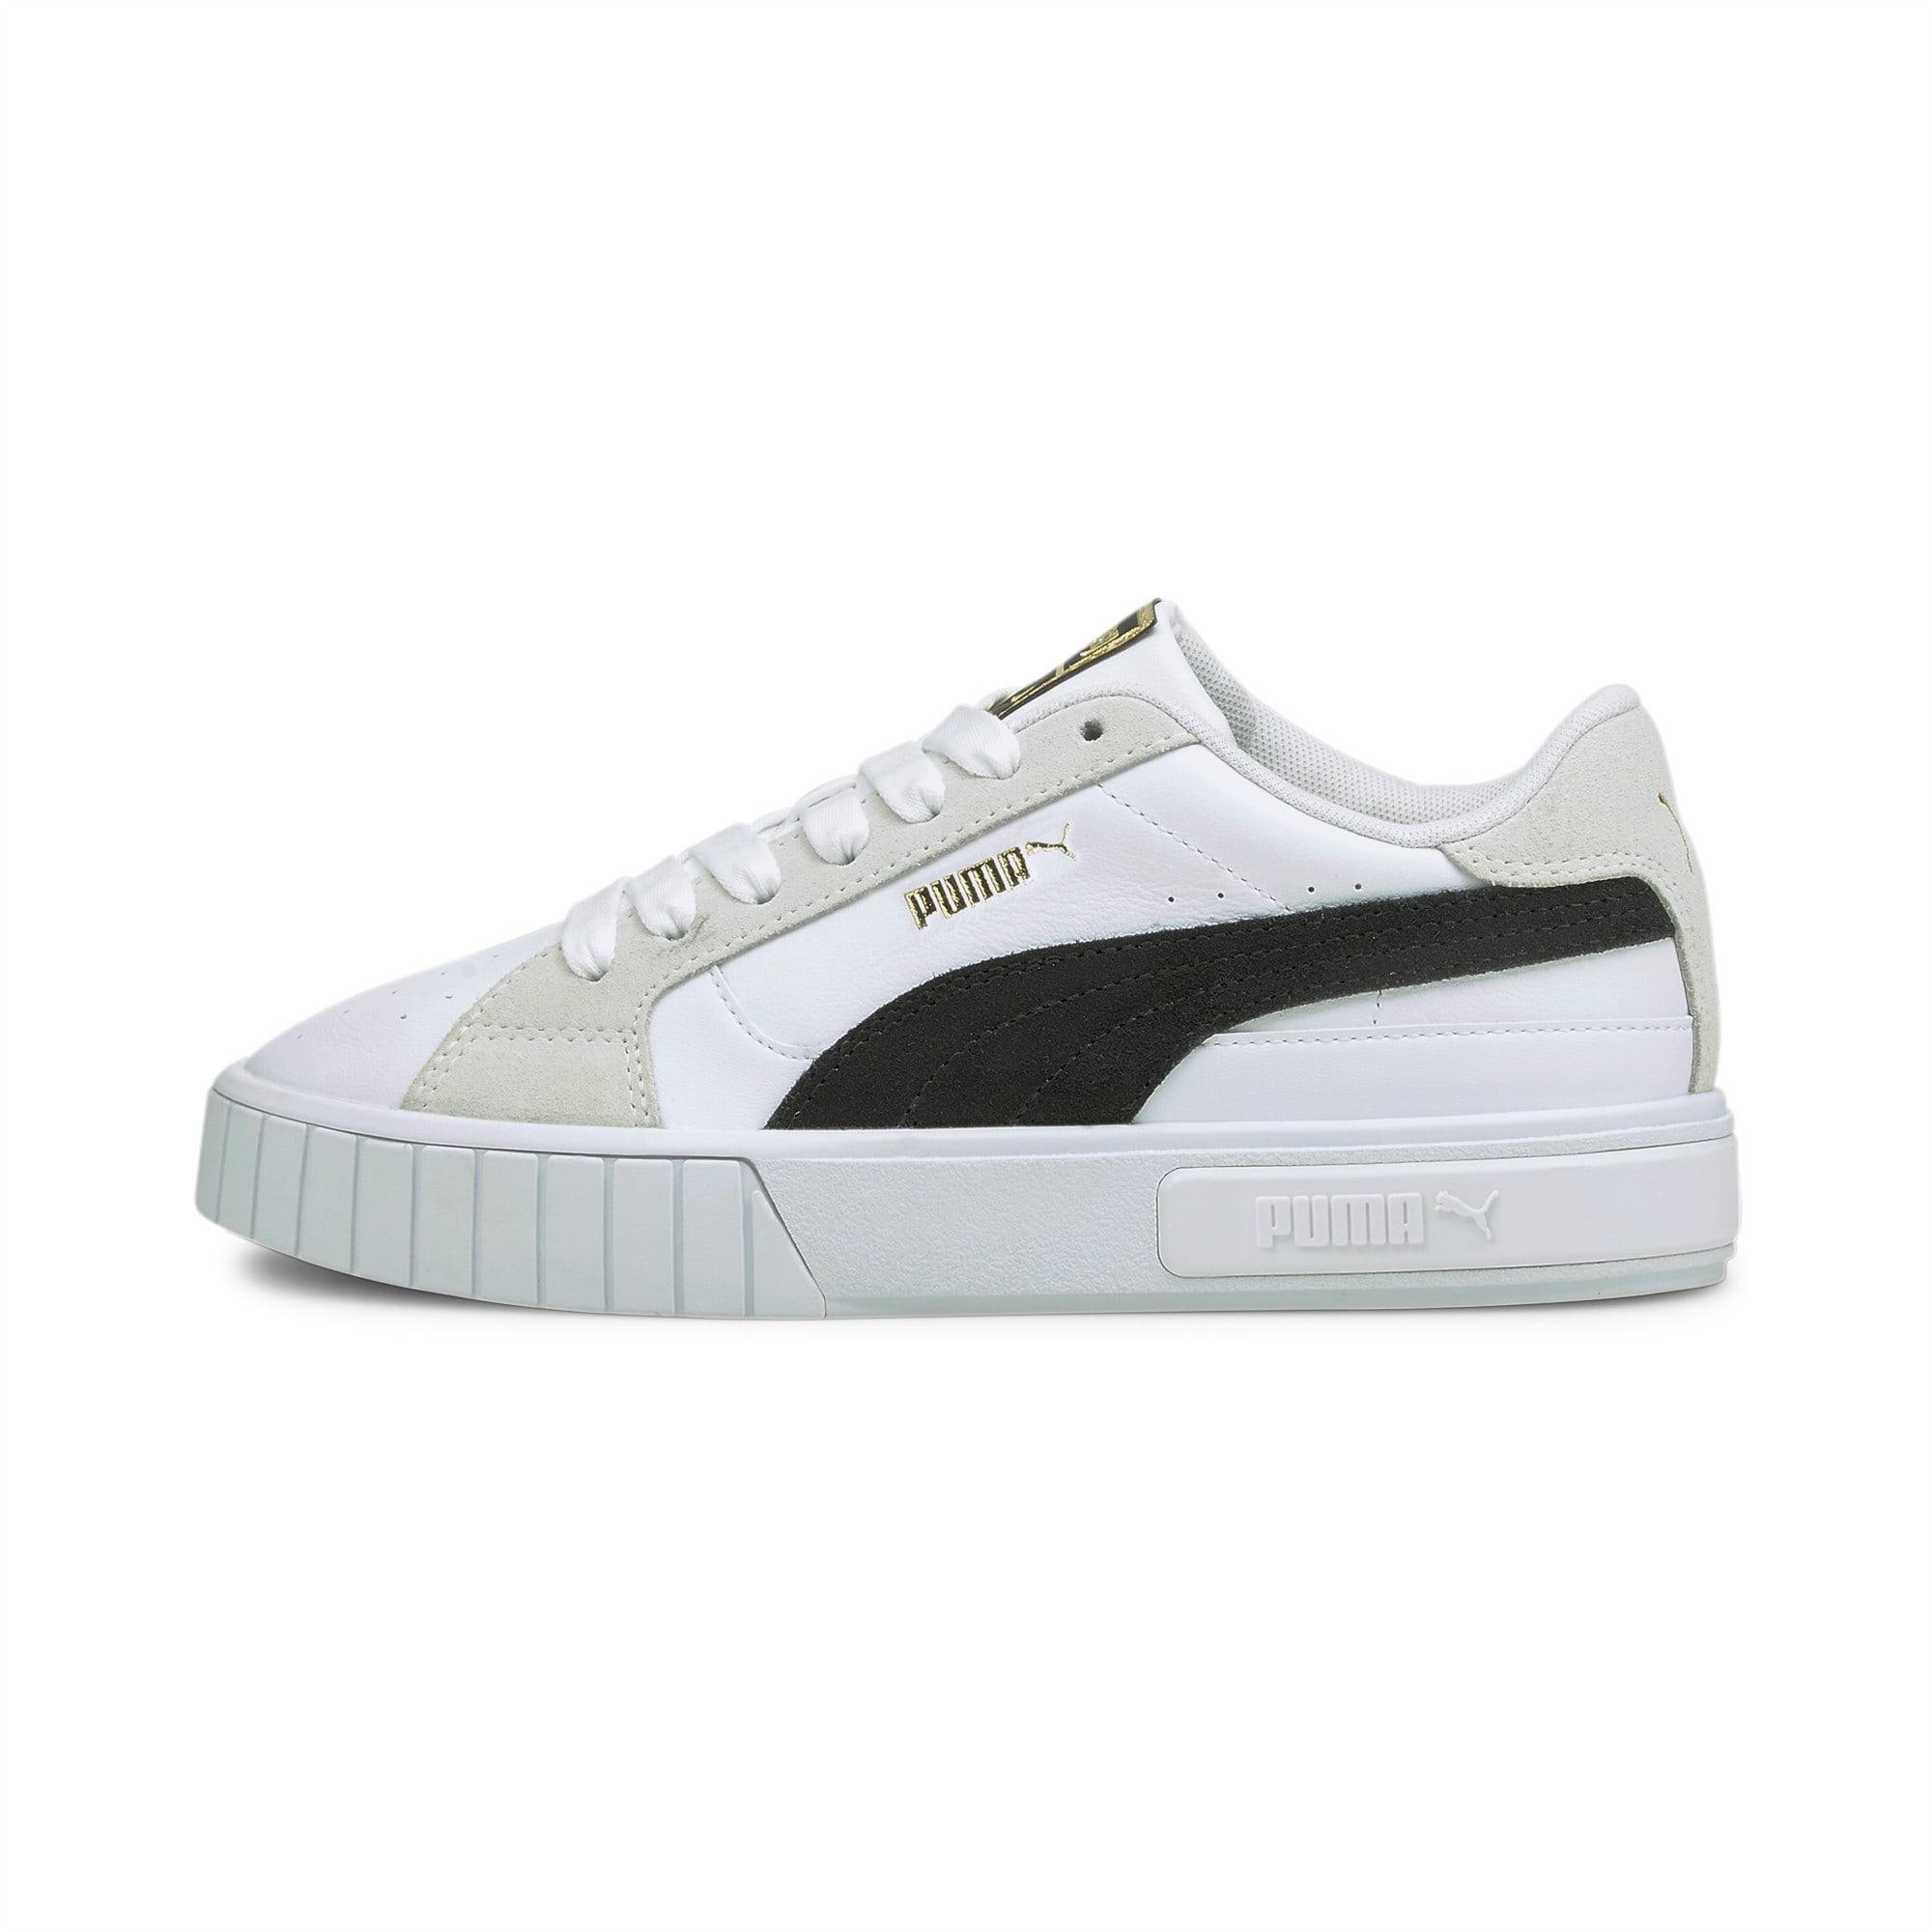 Cali Star Mix sneakers dames, Wit/Zwart, Maat 36   PUMA